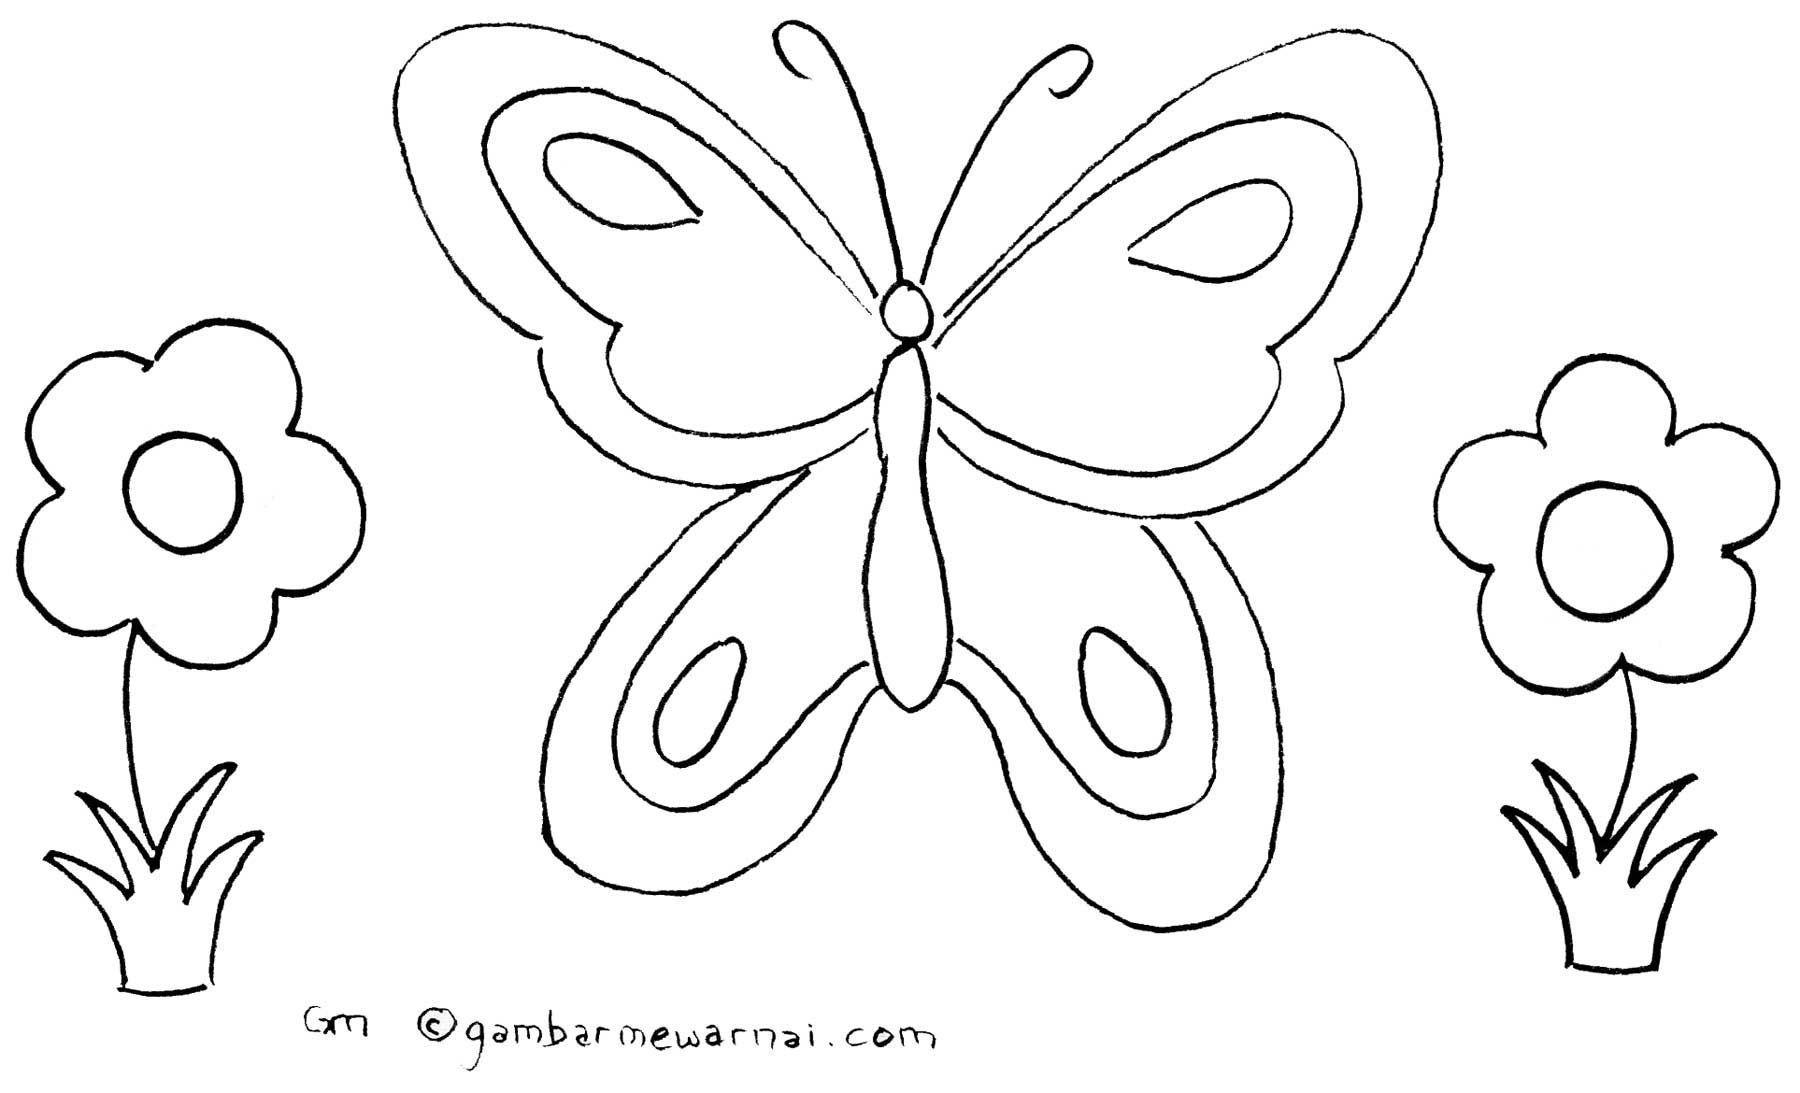 Gambar Mewarnai Kupu Kupu A Beautiful Butterfly Pinterest Buku Mewarnai Gambar Hewan Gambar